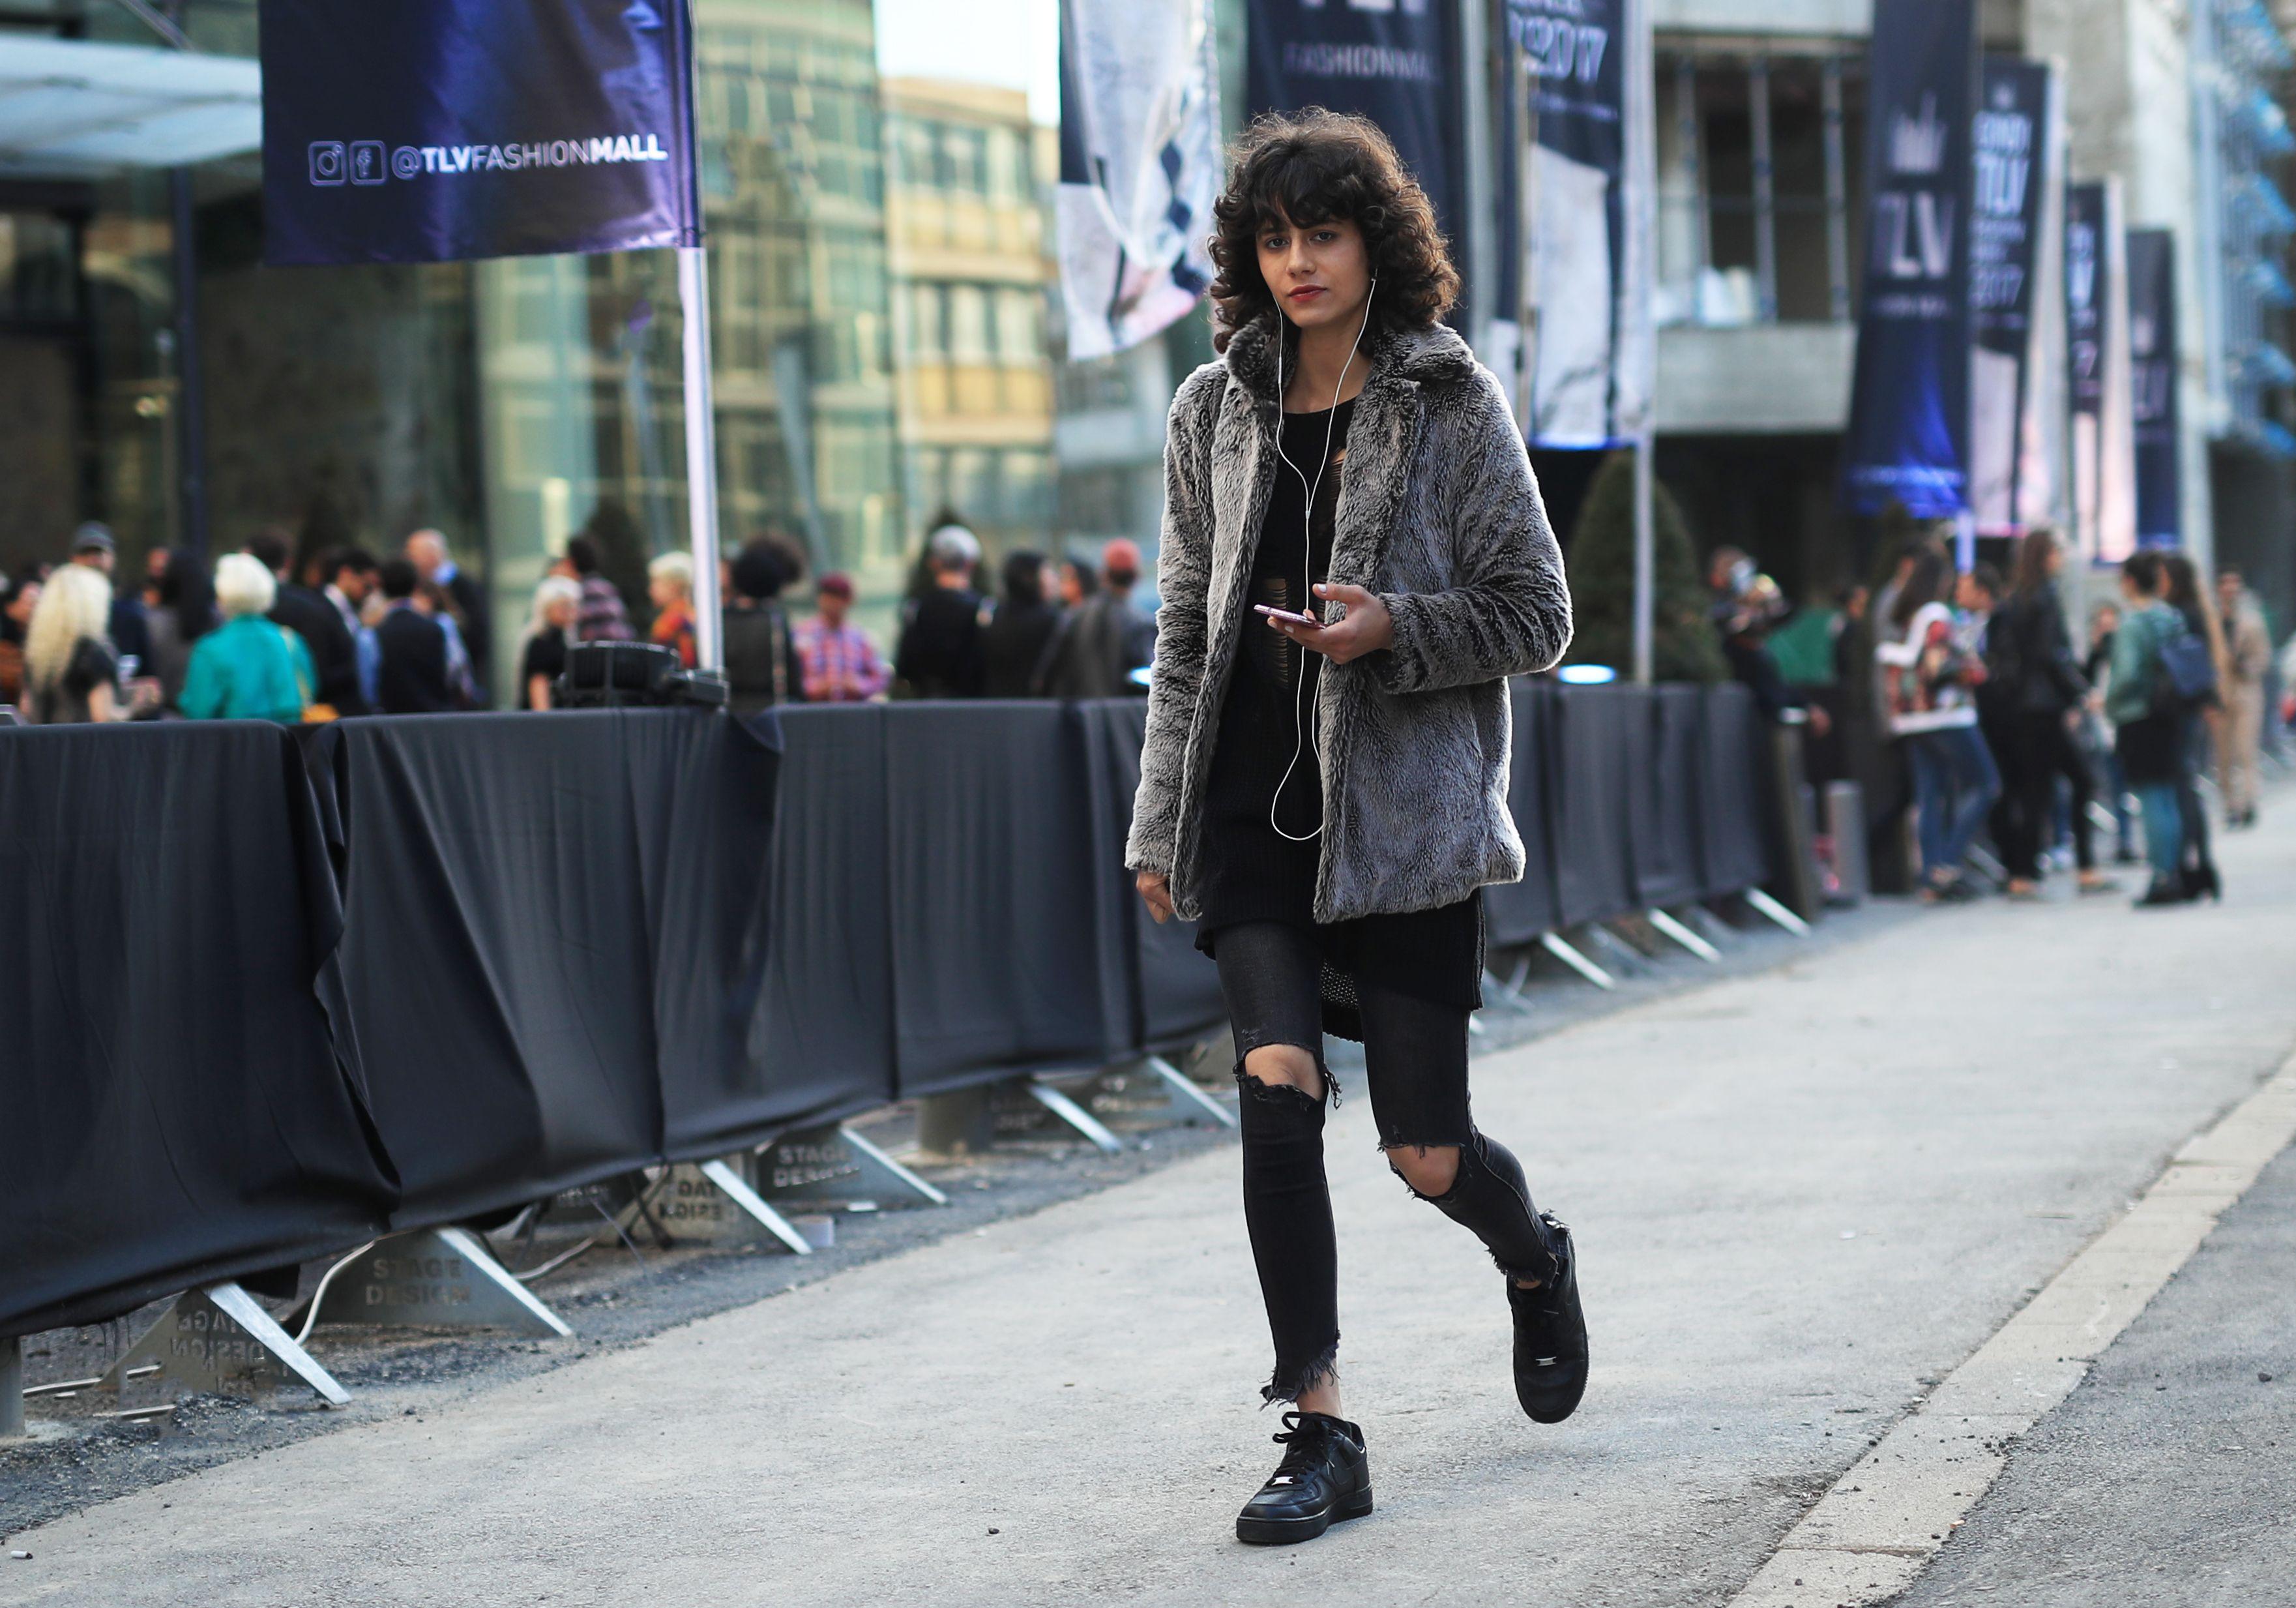 During A/W 2018 #telviv #fashionweek #style #streetstyle#fashion #streetfashion #street #mode #moda #stylish#nofilter #loveit #design #trend #fashionable #beautiful  #woman #arbelkynan